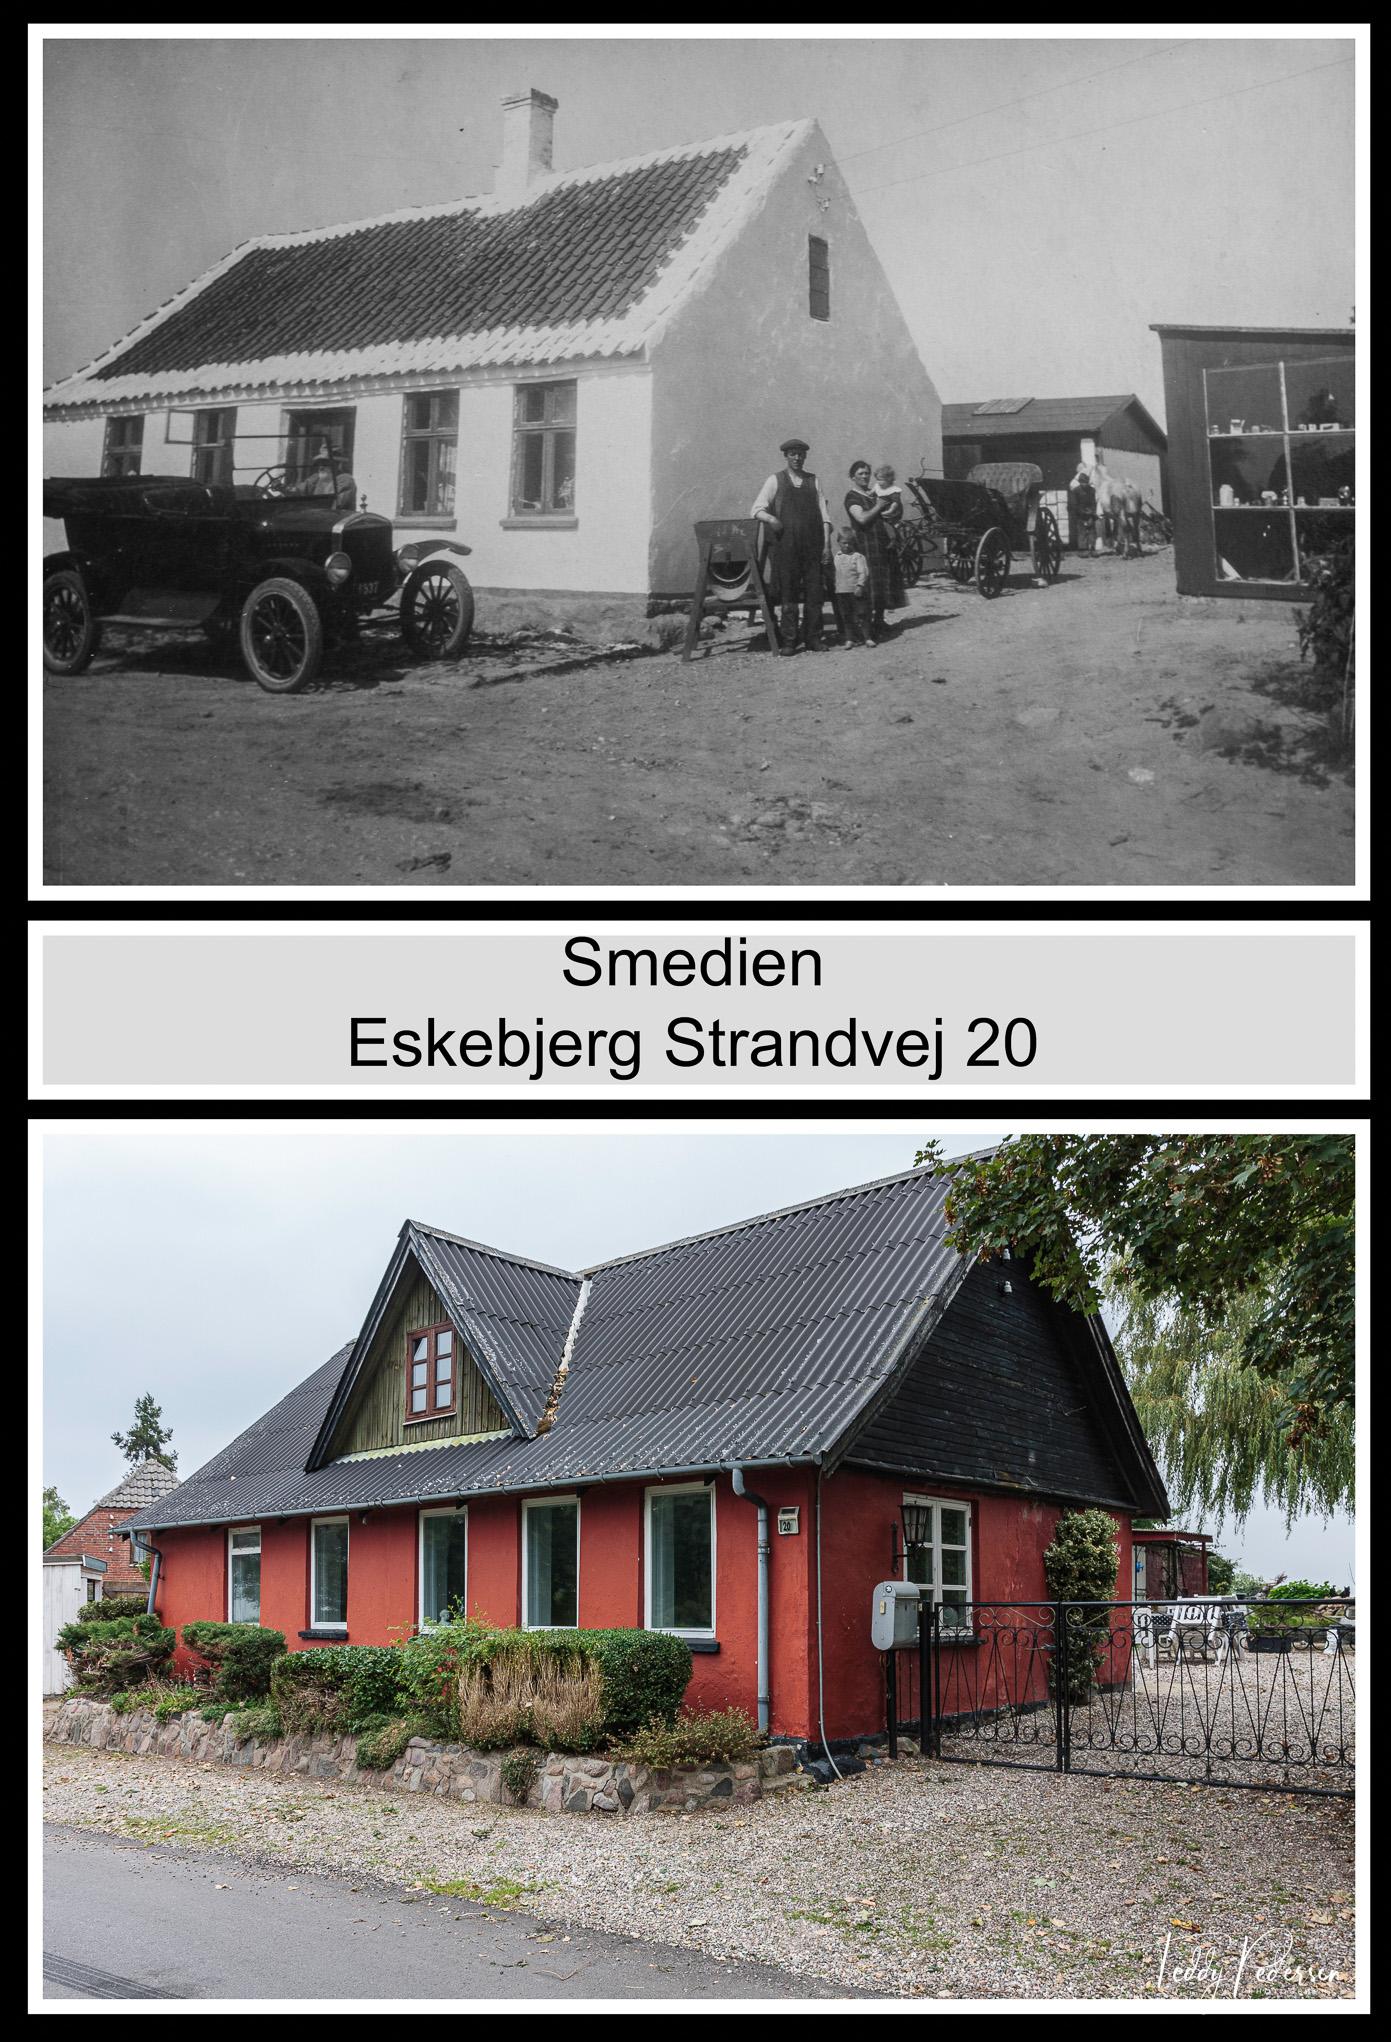 029-008-Smeden-Eskebjerg-Strandvej_HighRes_LowRes